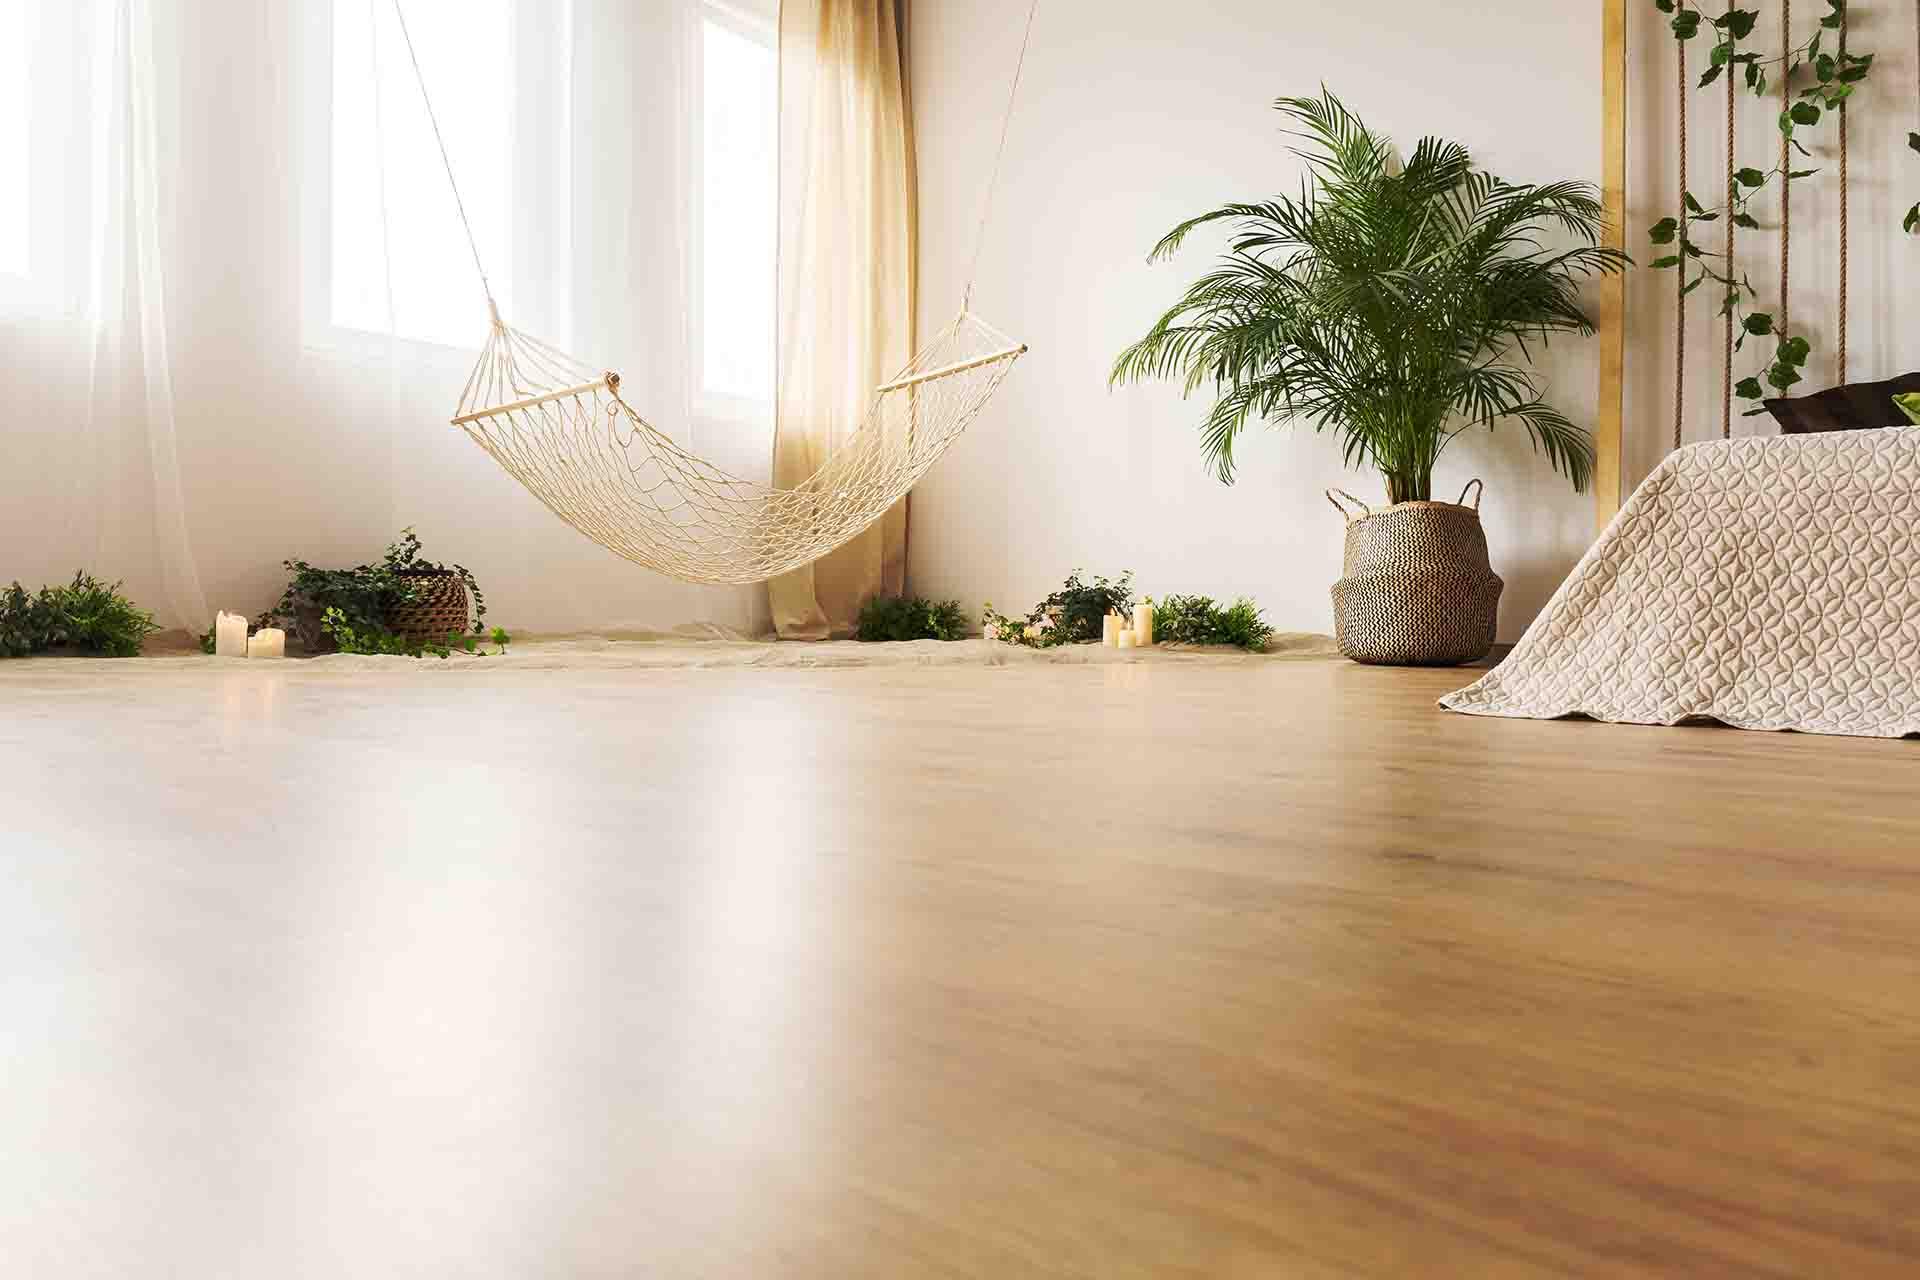 How often should I clean hardwood floors?